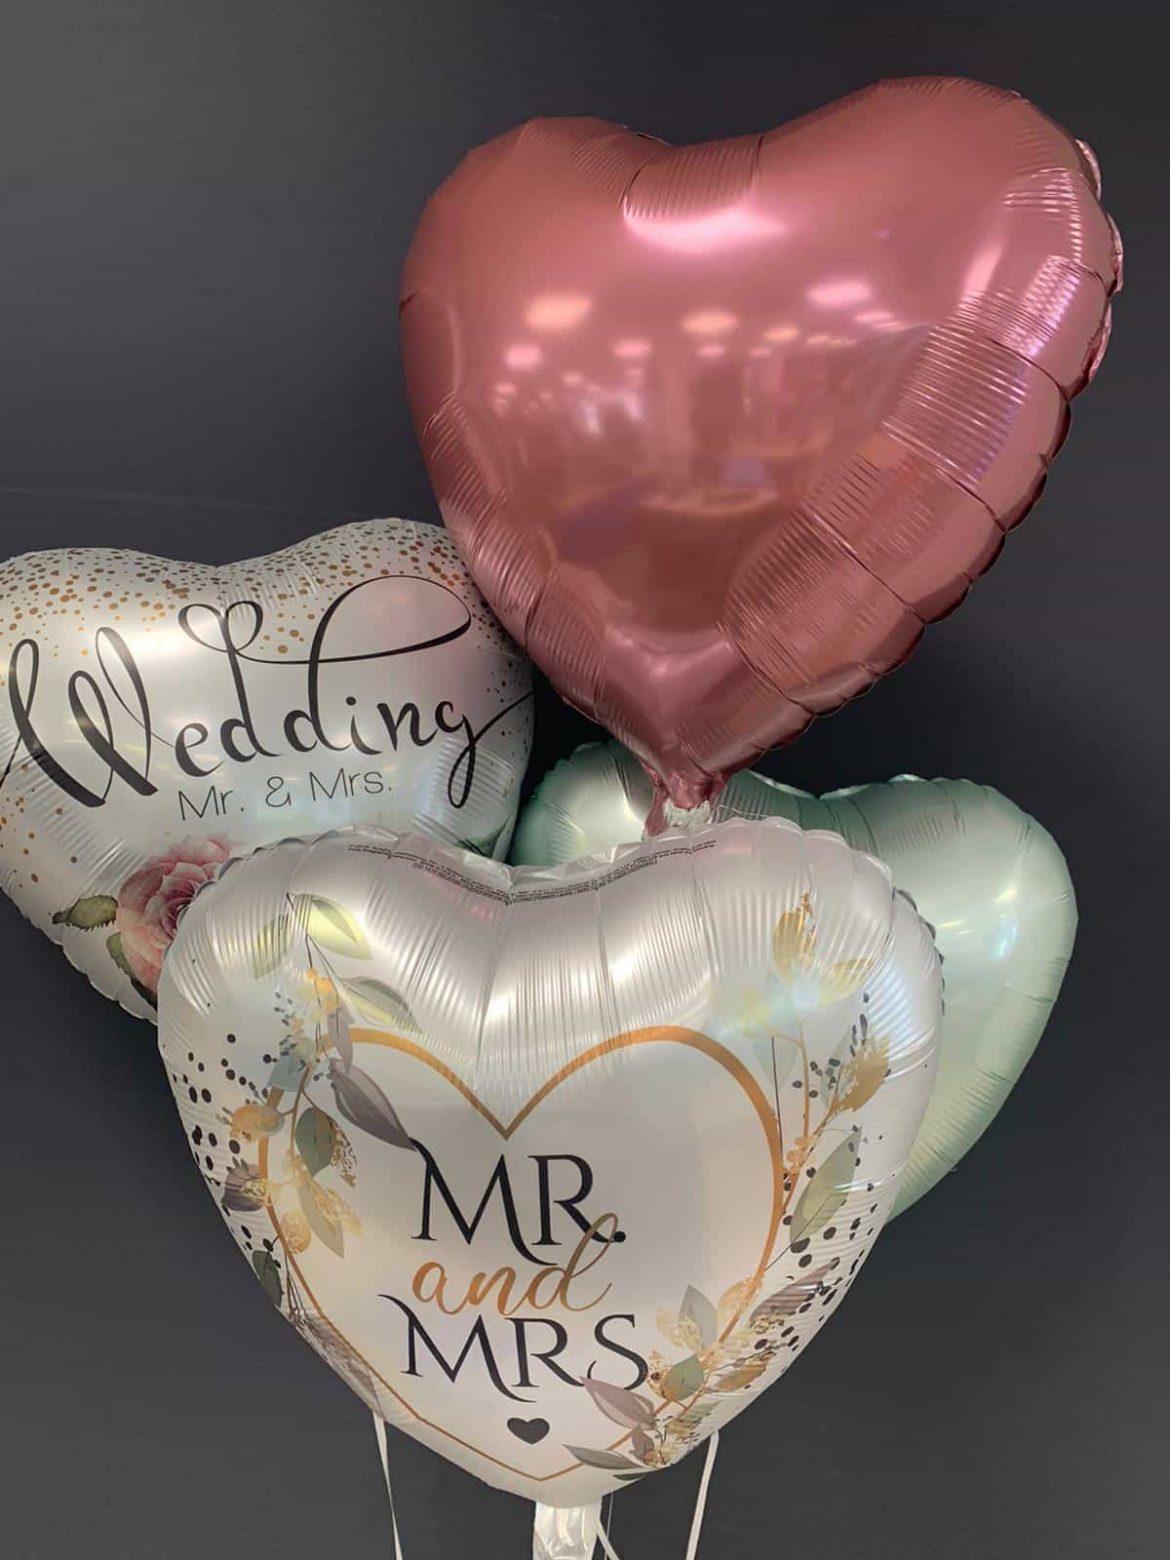 Wedding Mr & Mrs € 5,90 <br> Mr and Mrs € 5,90 <br> Dekoballons € 4,50 1